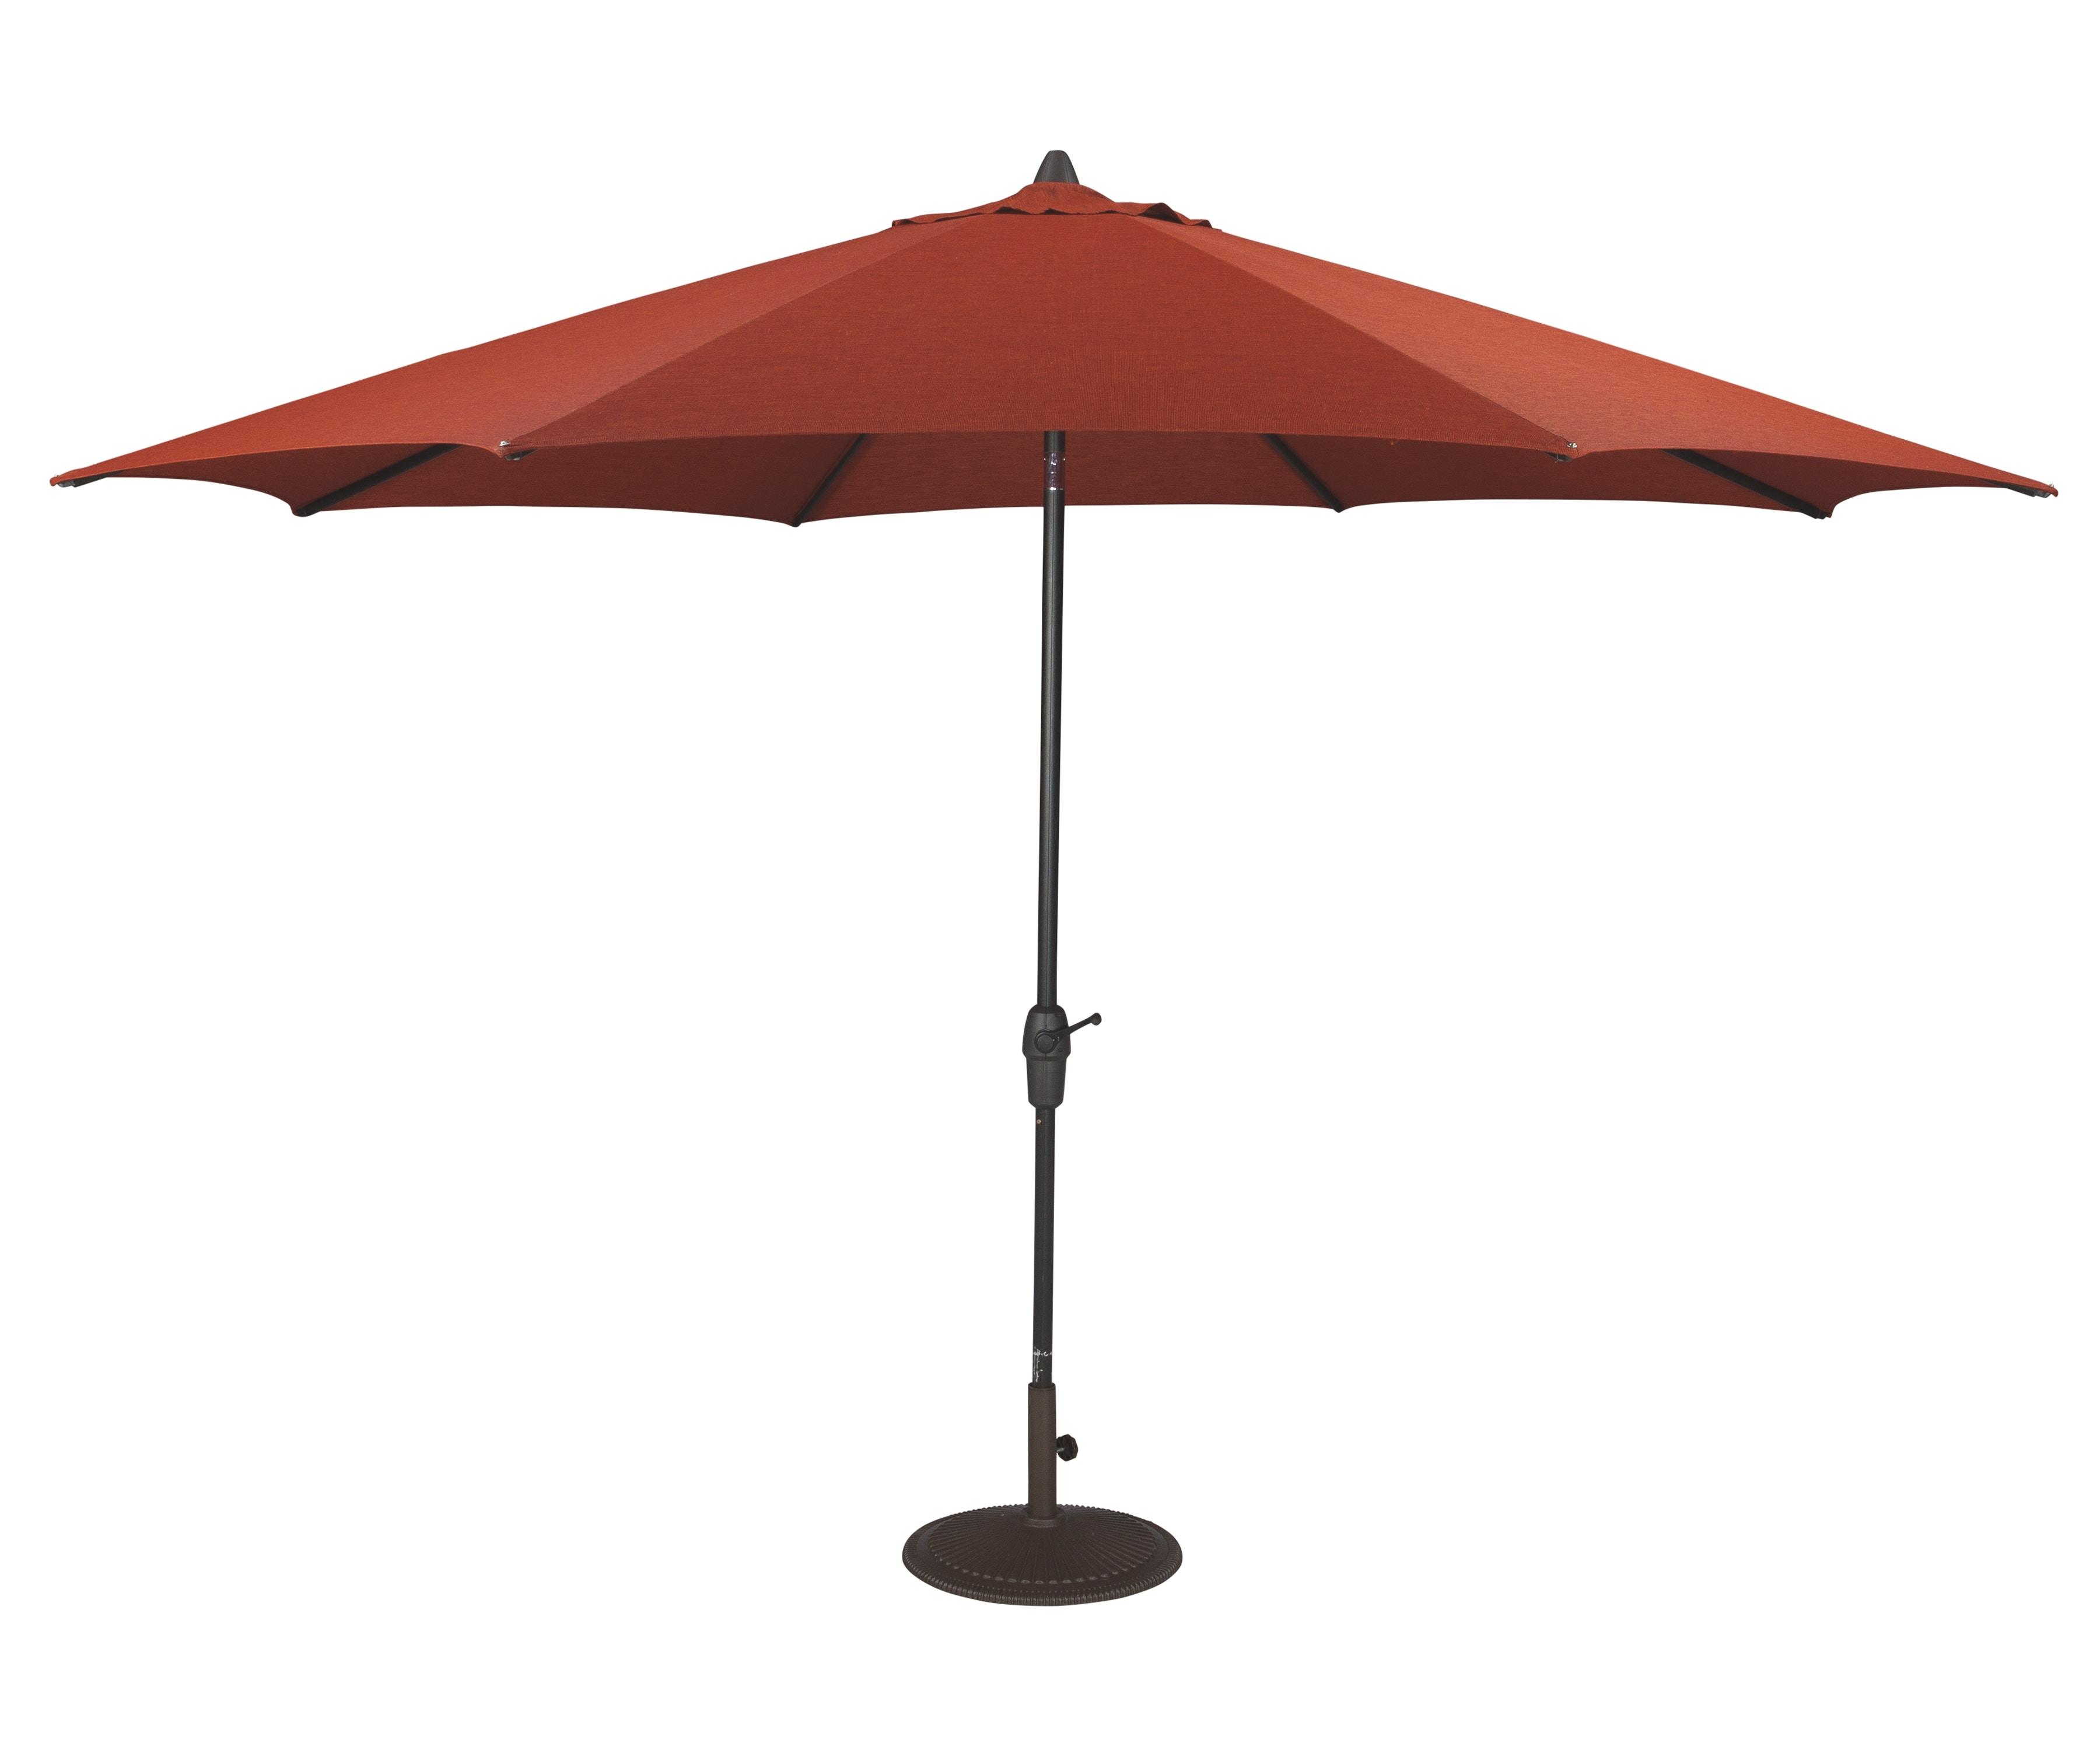 Signature Design By Ashley Outdoor Patio Umbrella Accessories 2